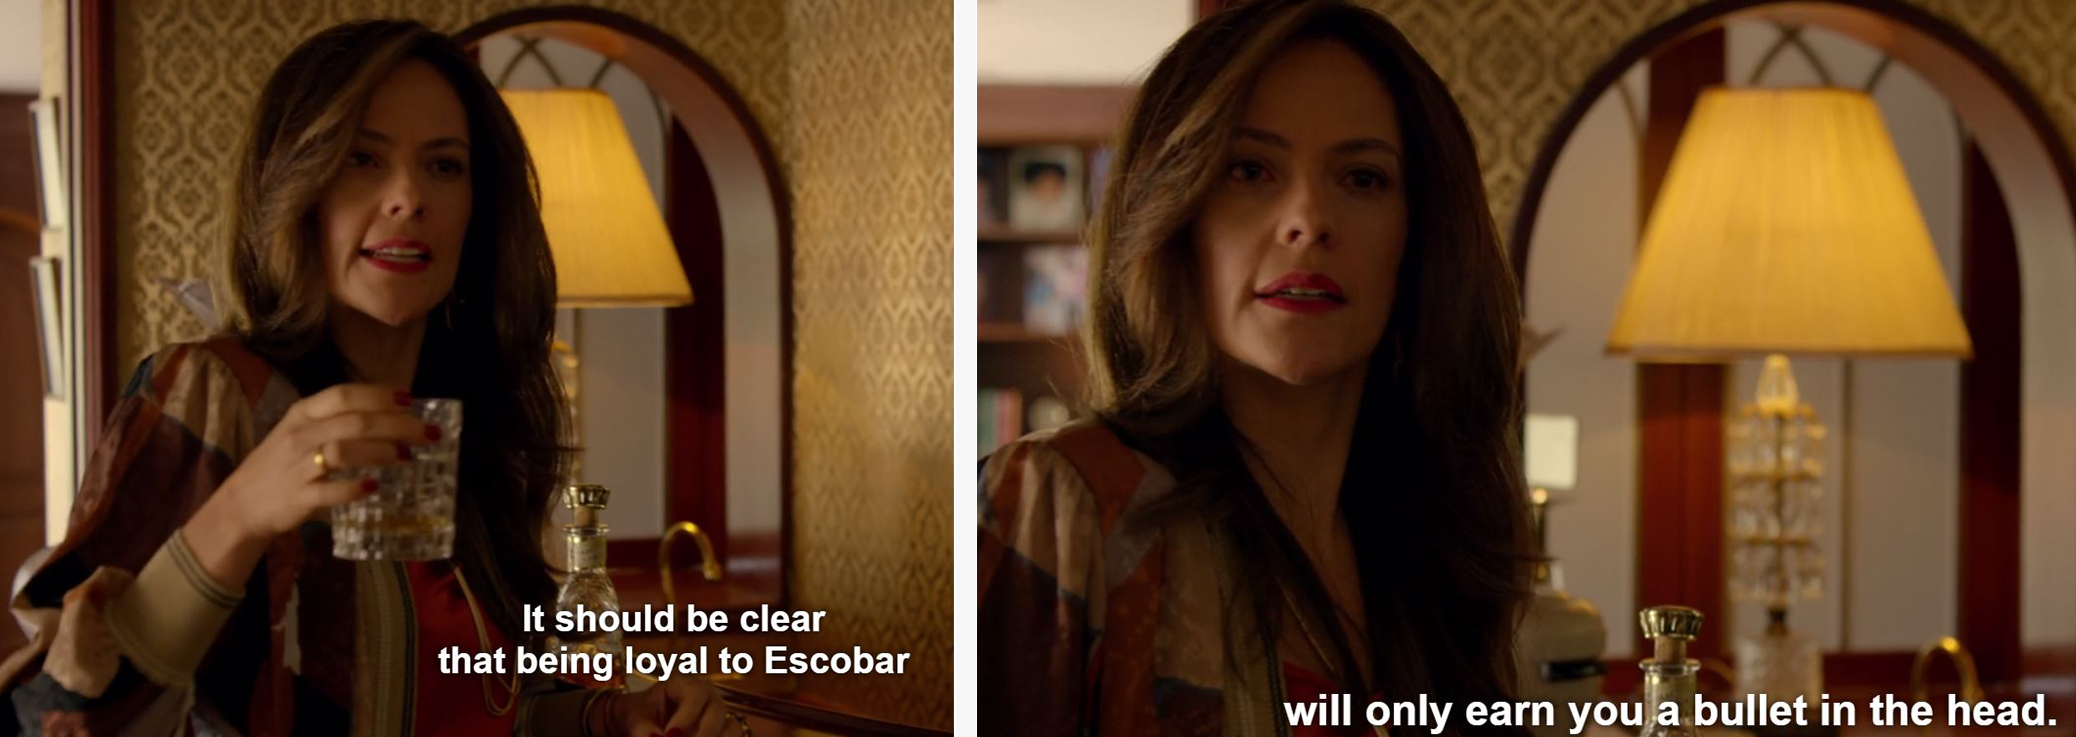 Narcos season 2 has been released on Netflix.